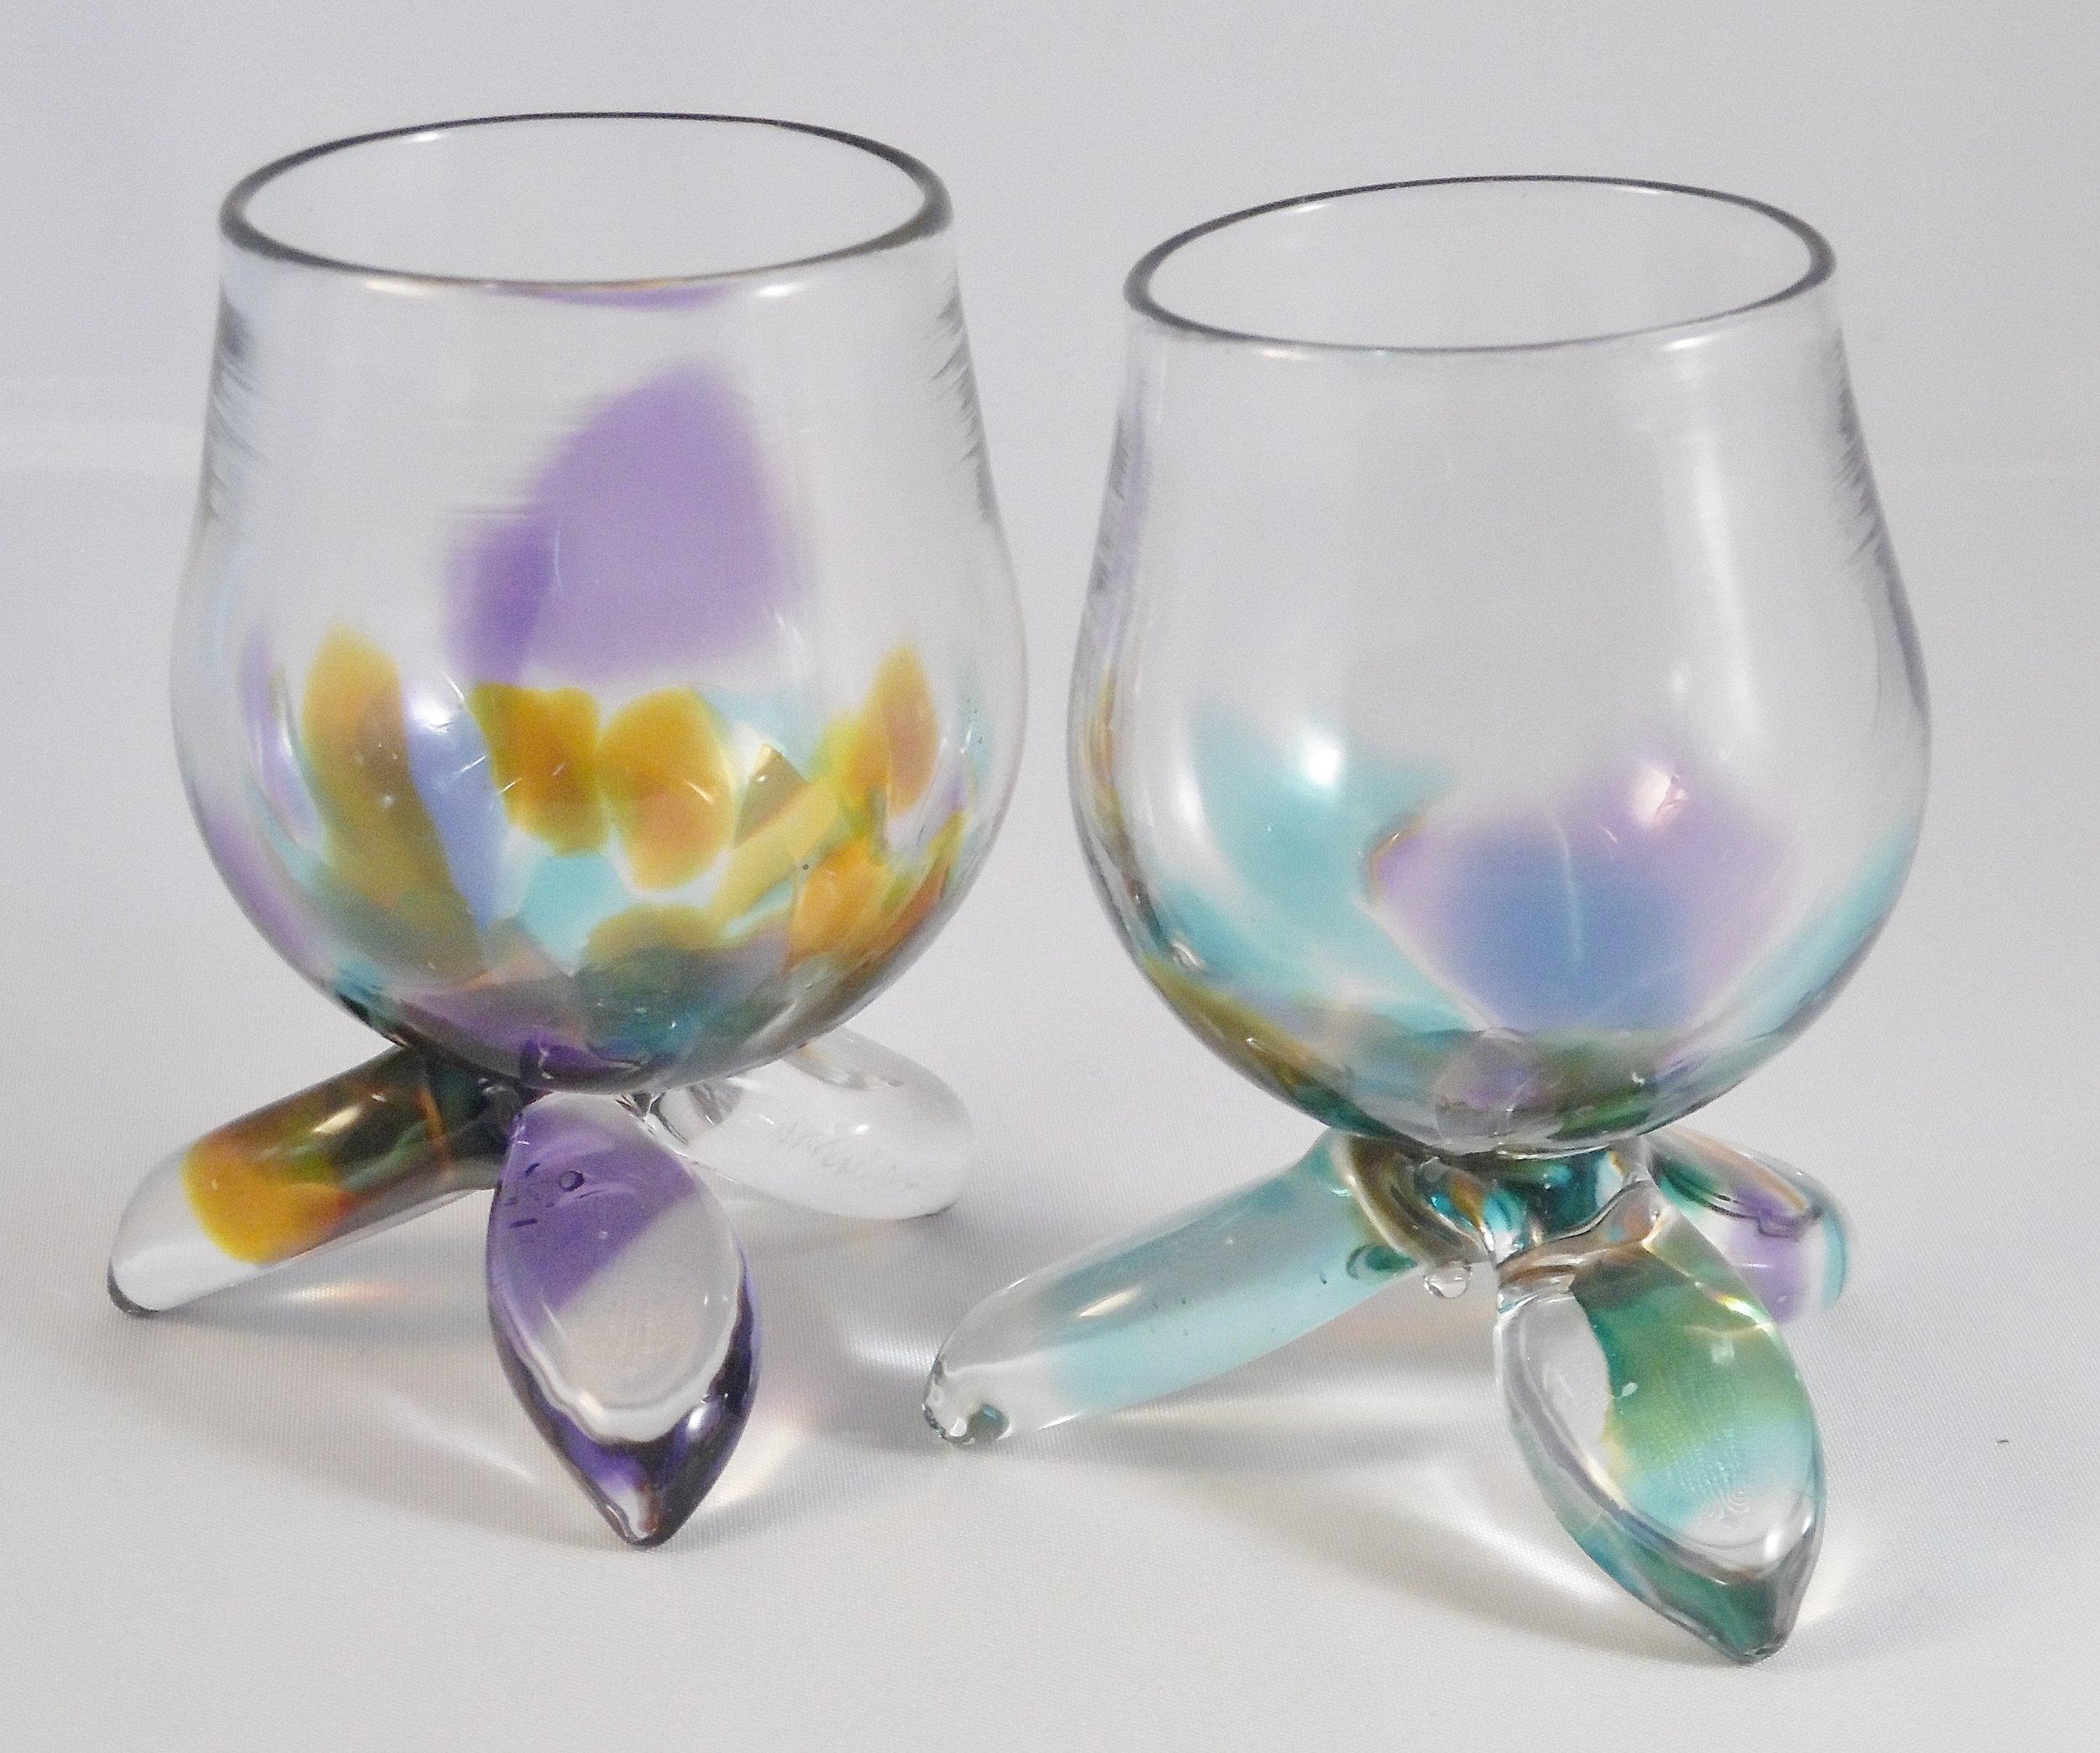 Ice Wine/Liqueur Glasses by Nicole Tremblay